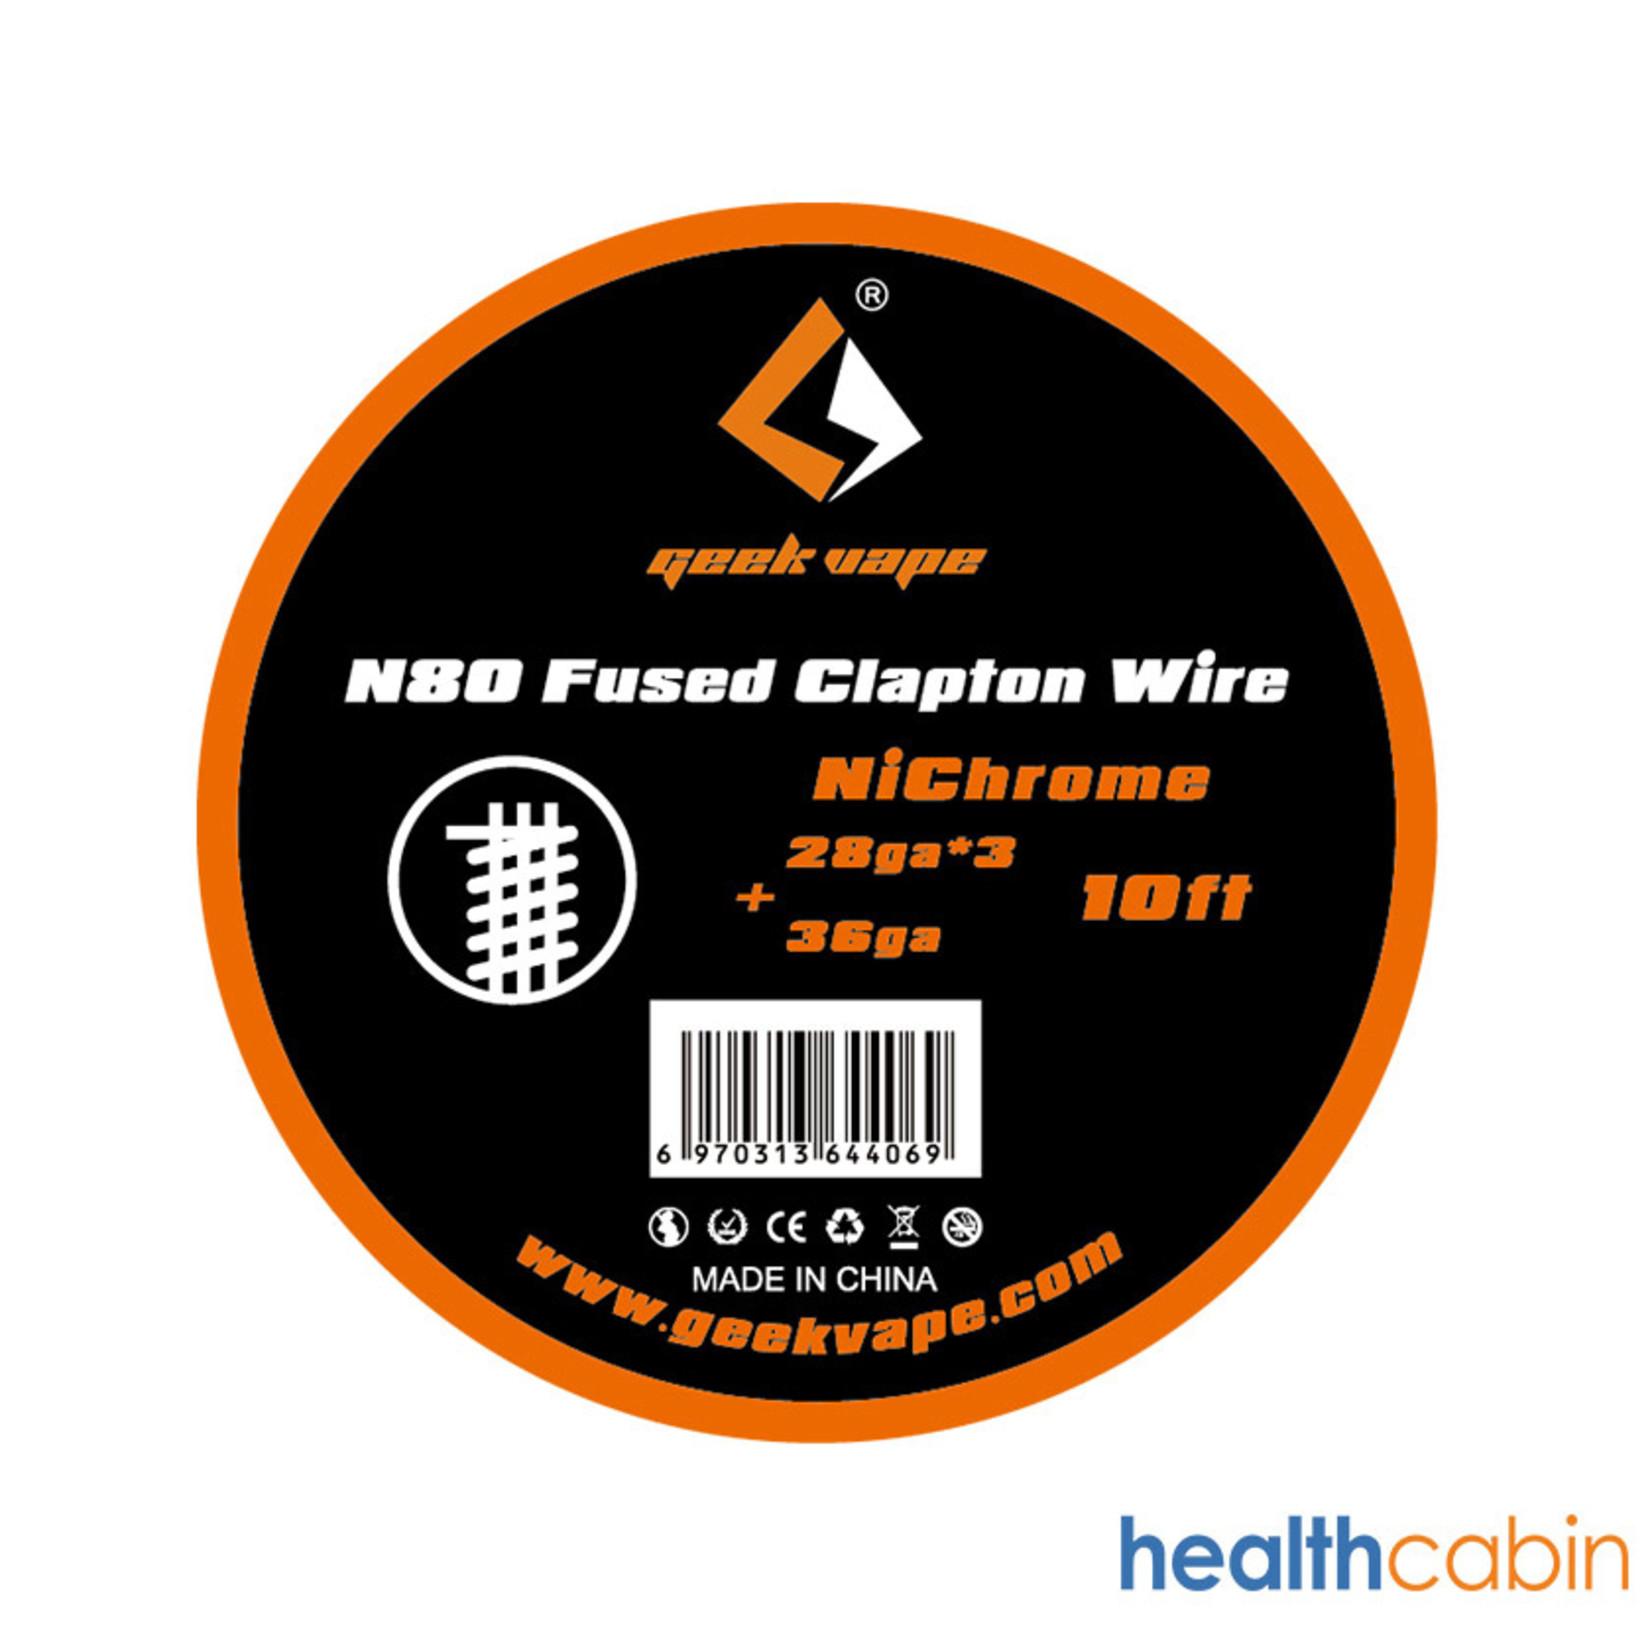 Geek Vape N80 Fused Clapton Wire